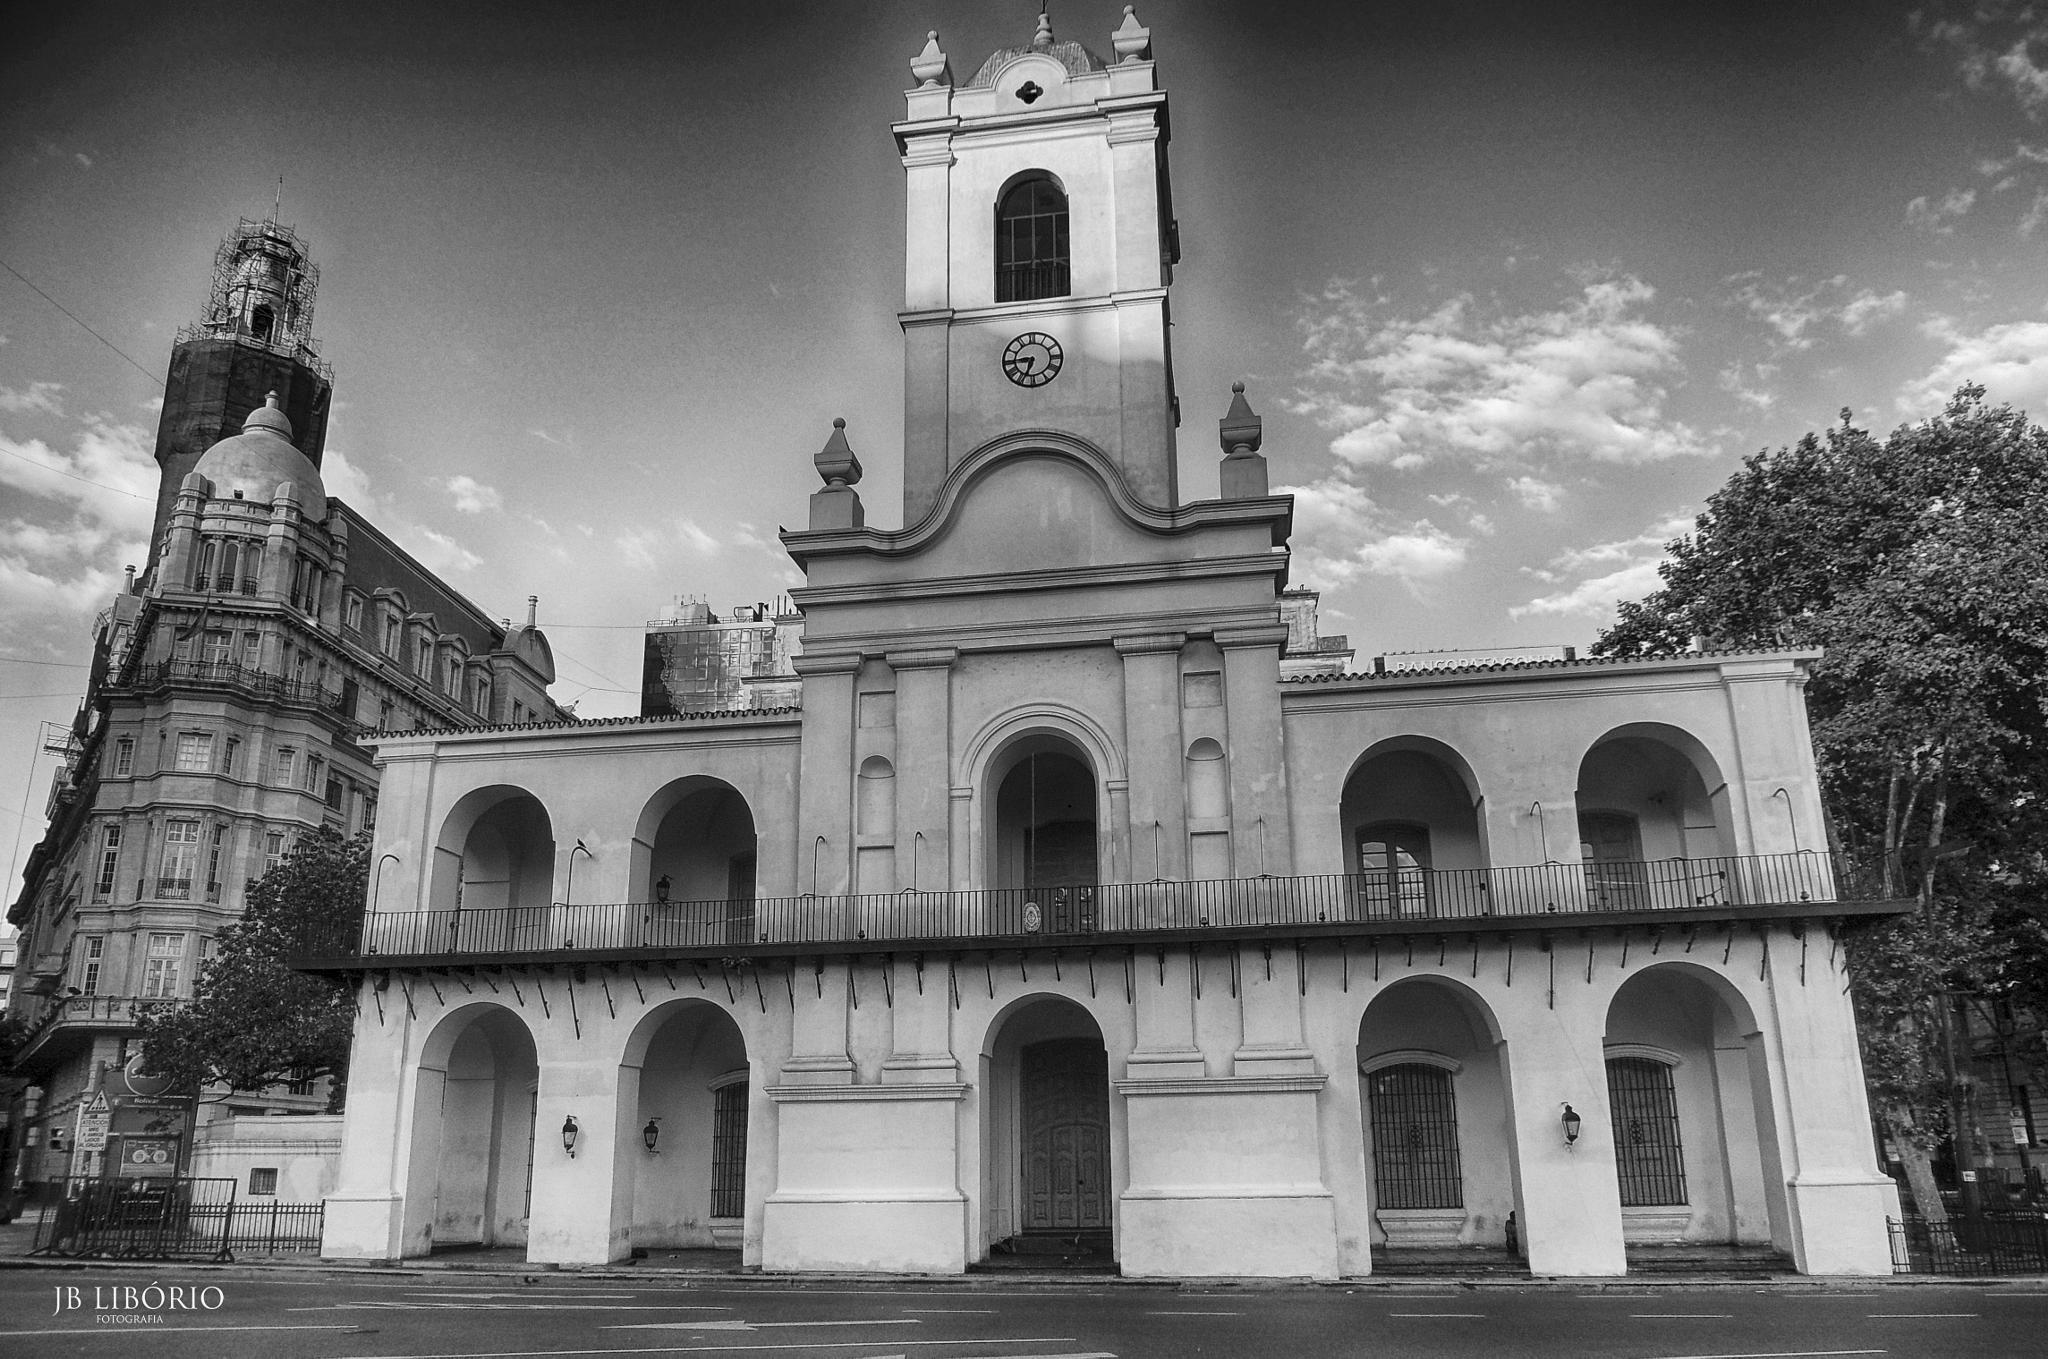 Cabildo - Buenos Aires - Argentina by Jose Liborio